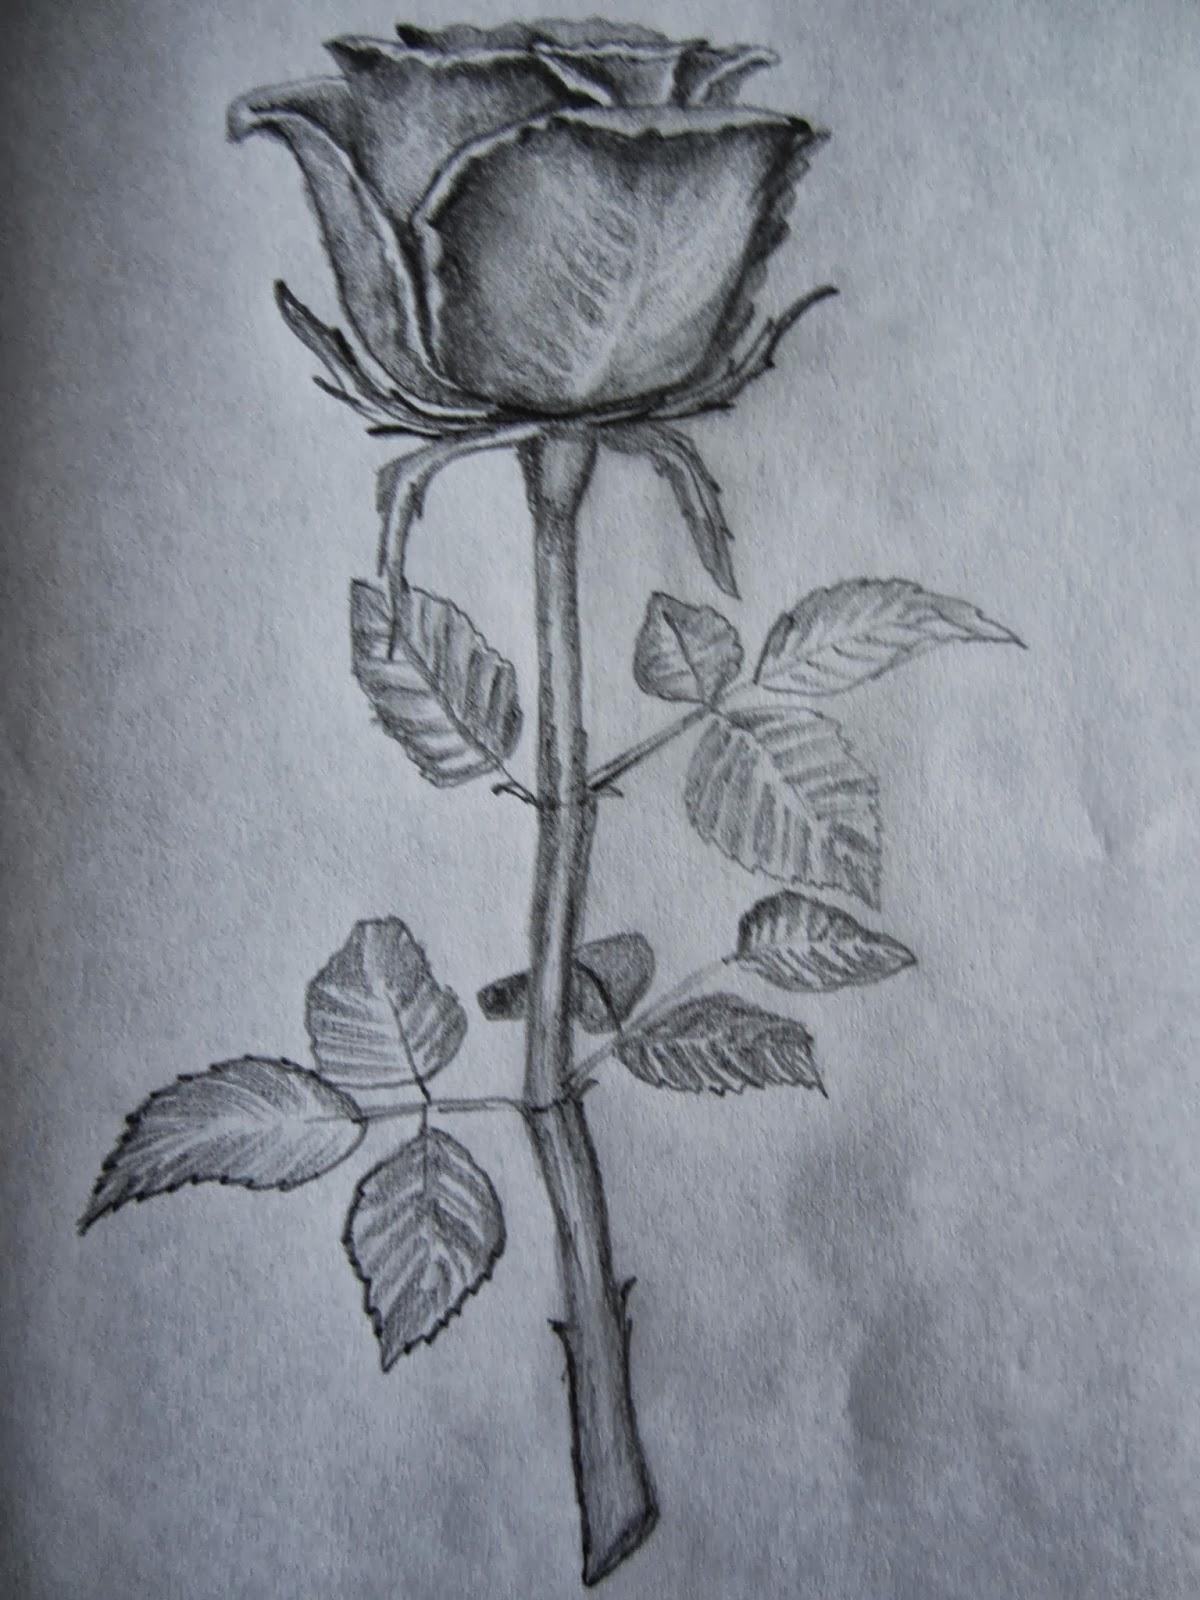 1200x1600 Rose Pencil Sketch Hd Image Rose Flower Pencil Drawing Rose